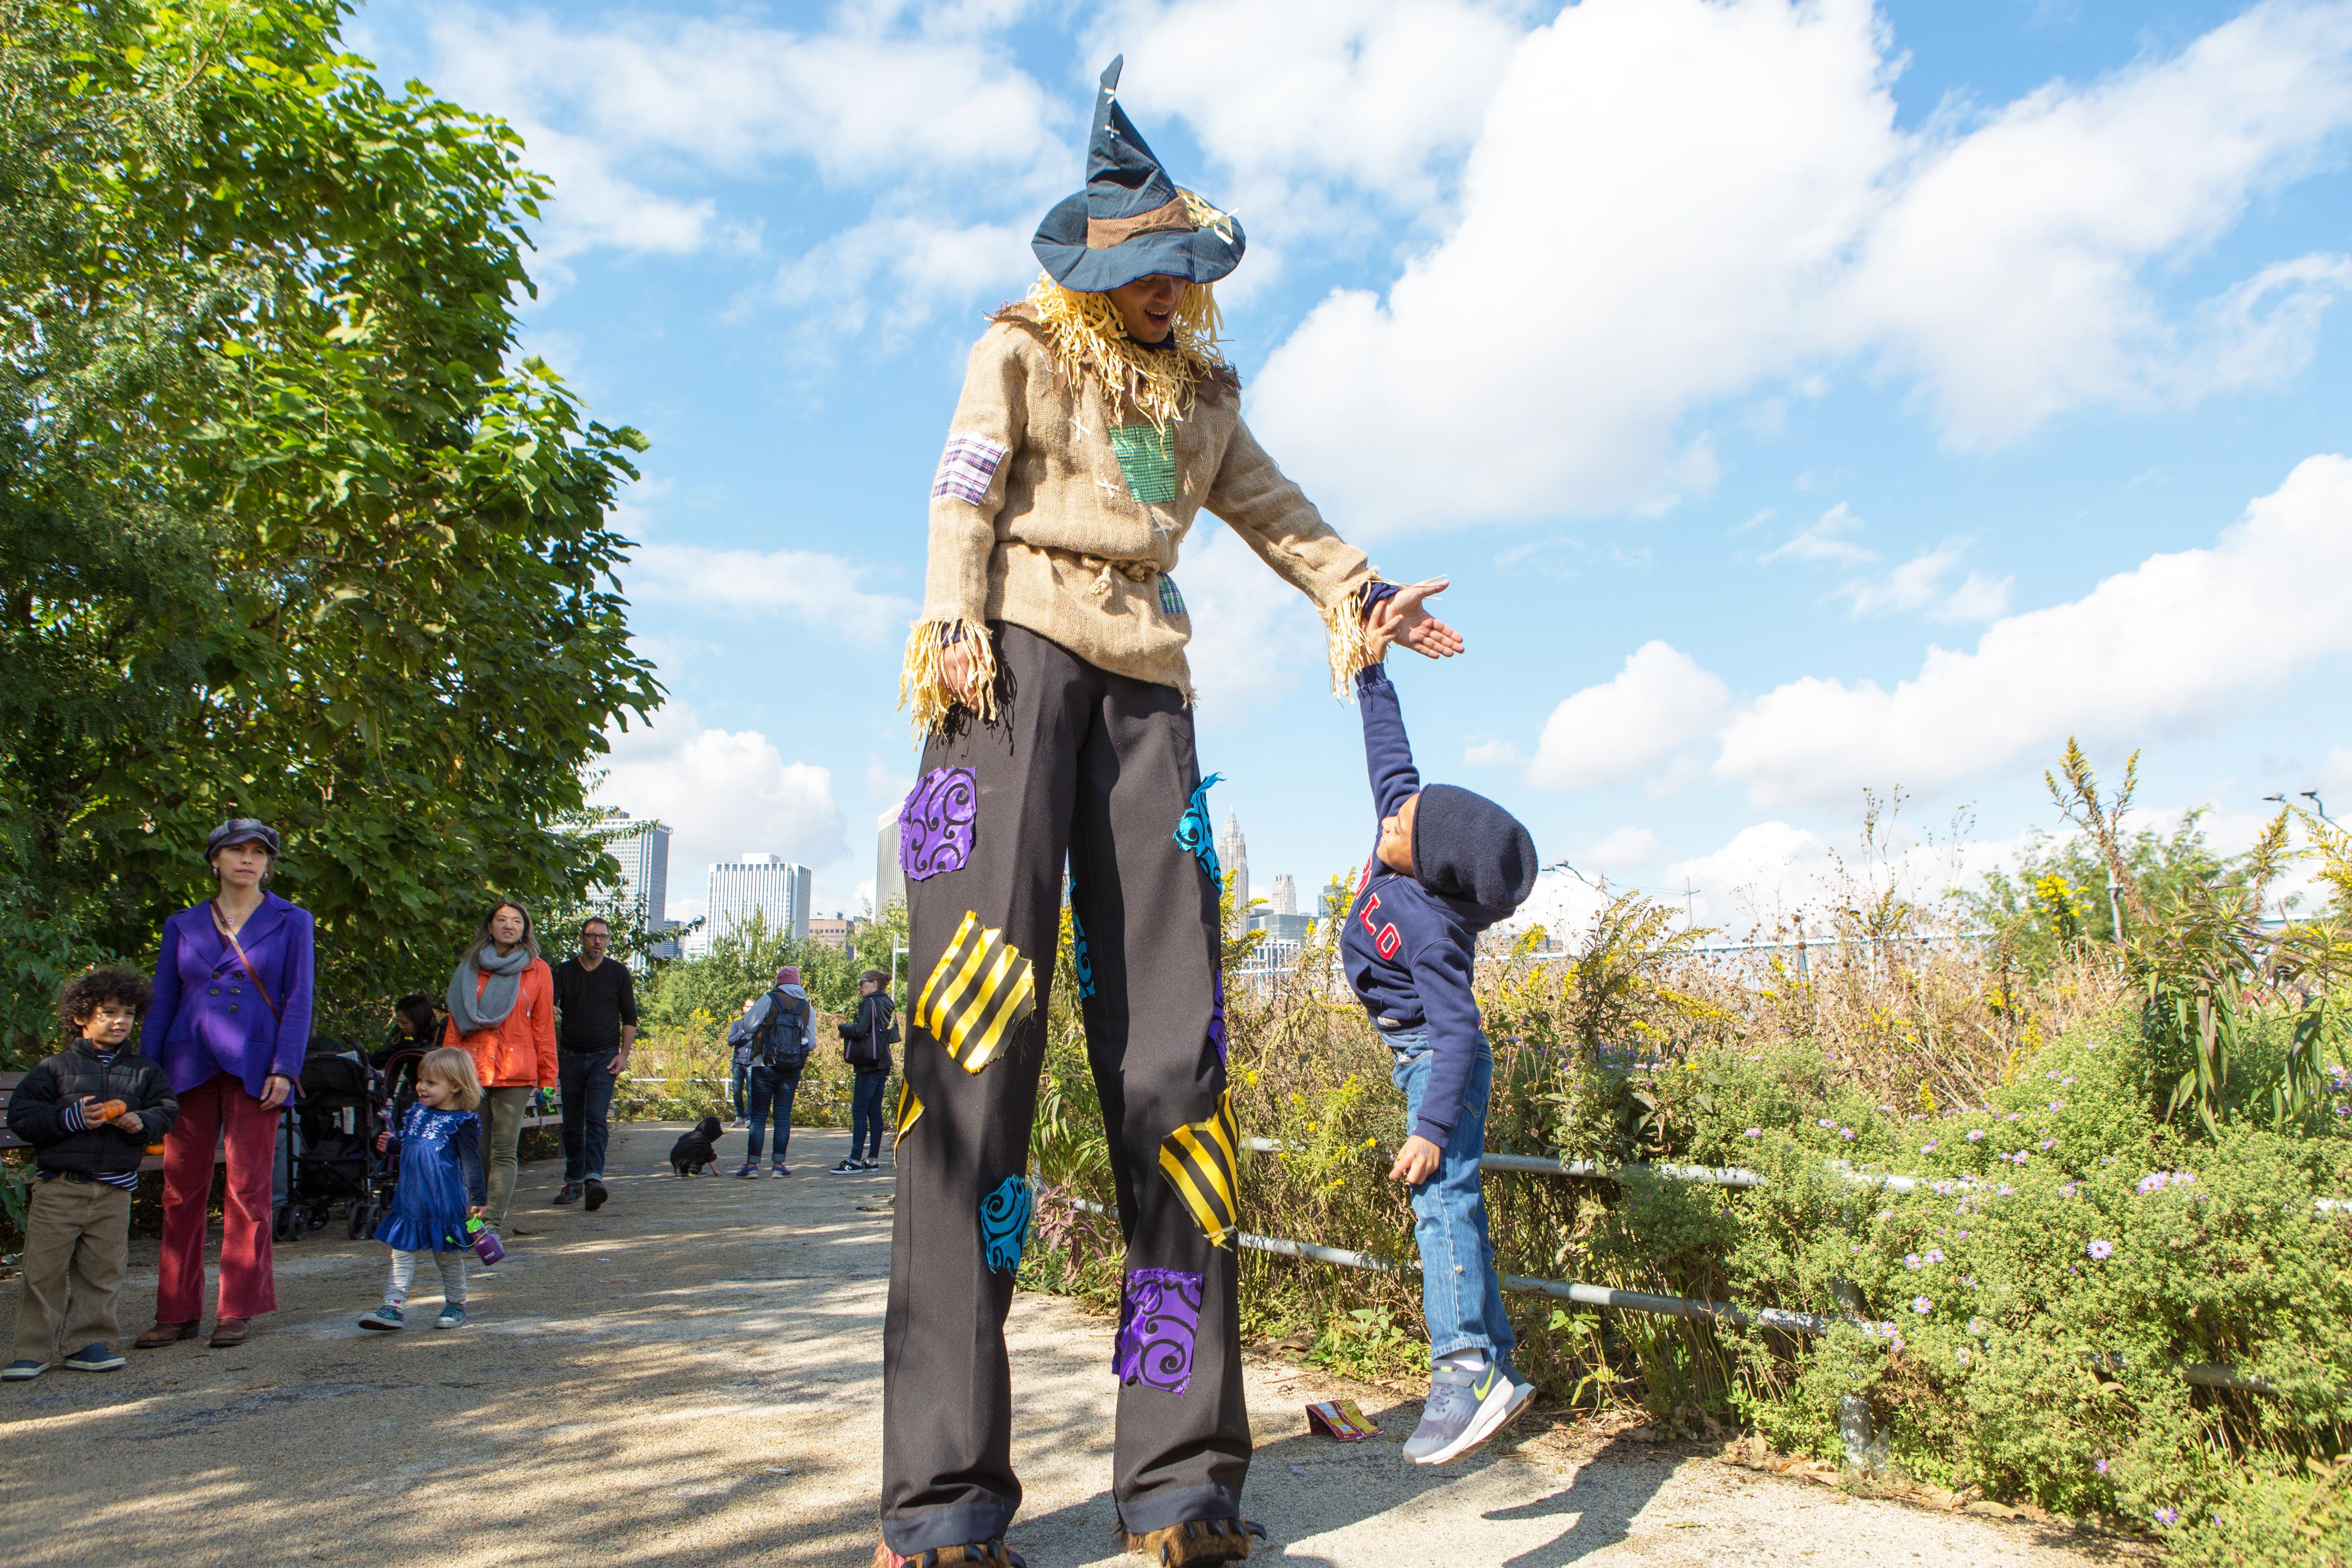 11th Annual Harvest Festival at Brooklyn Bridge Park, Pier 6